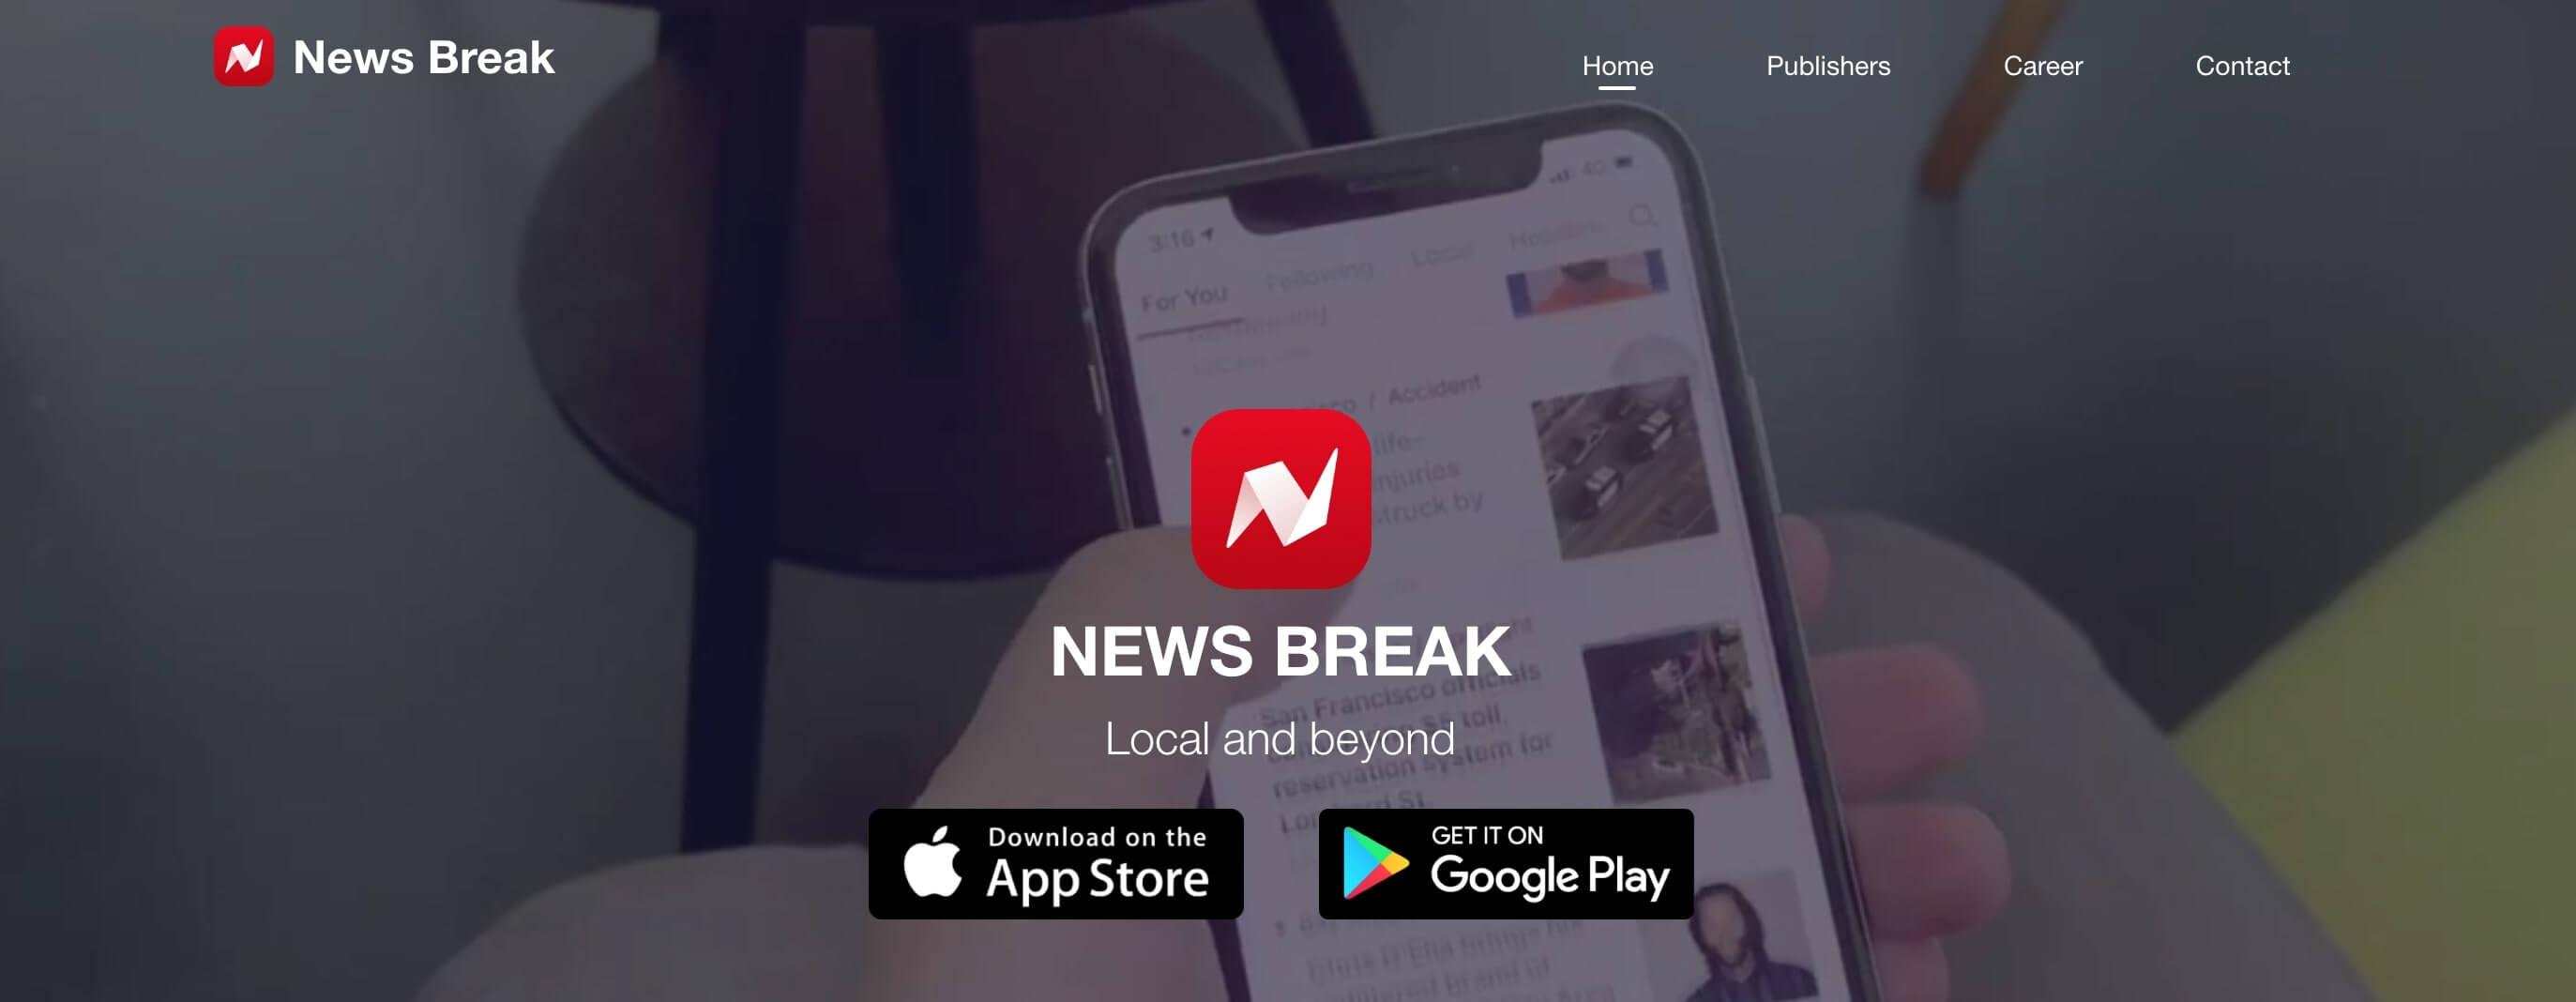 News Break